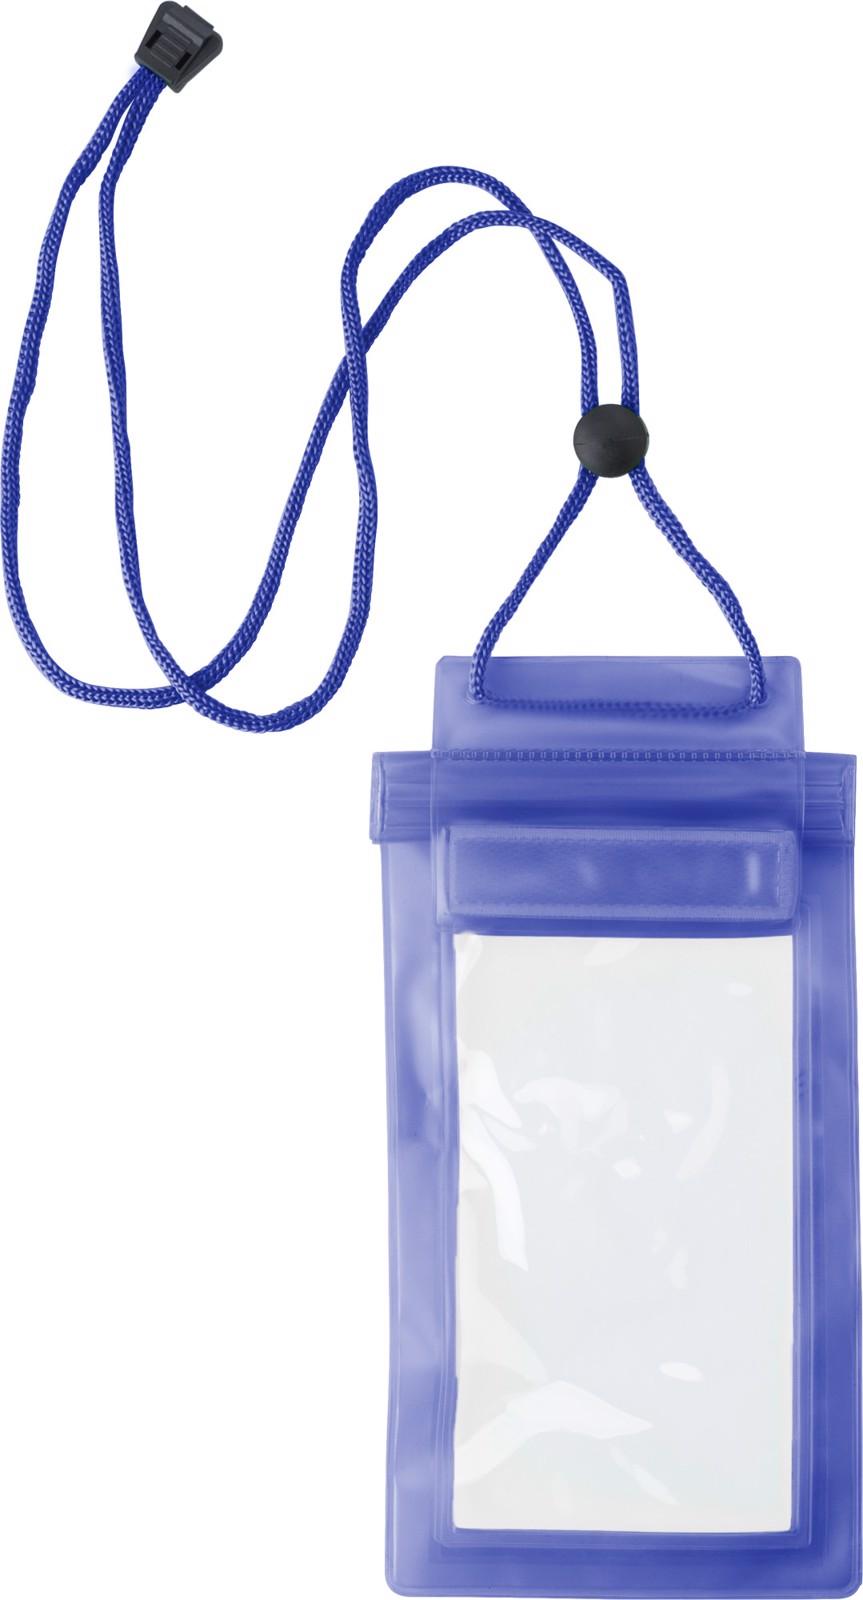 PVC pouch for mobile devices - Cobalt Blue